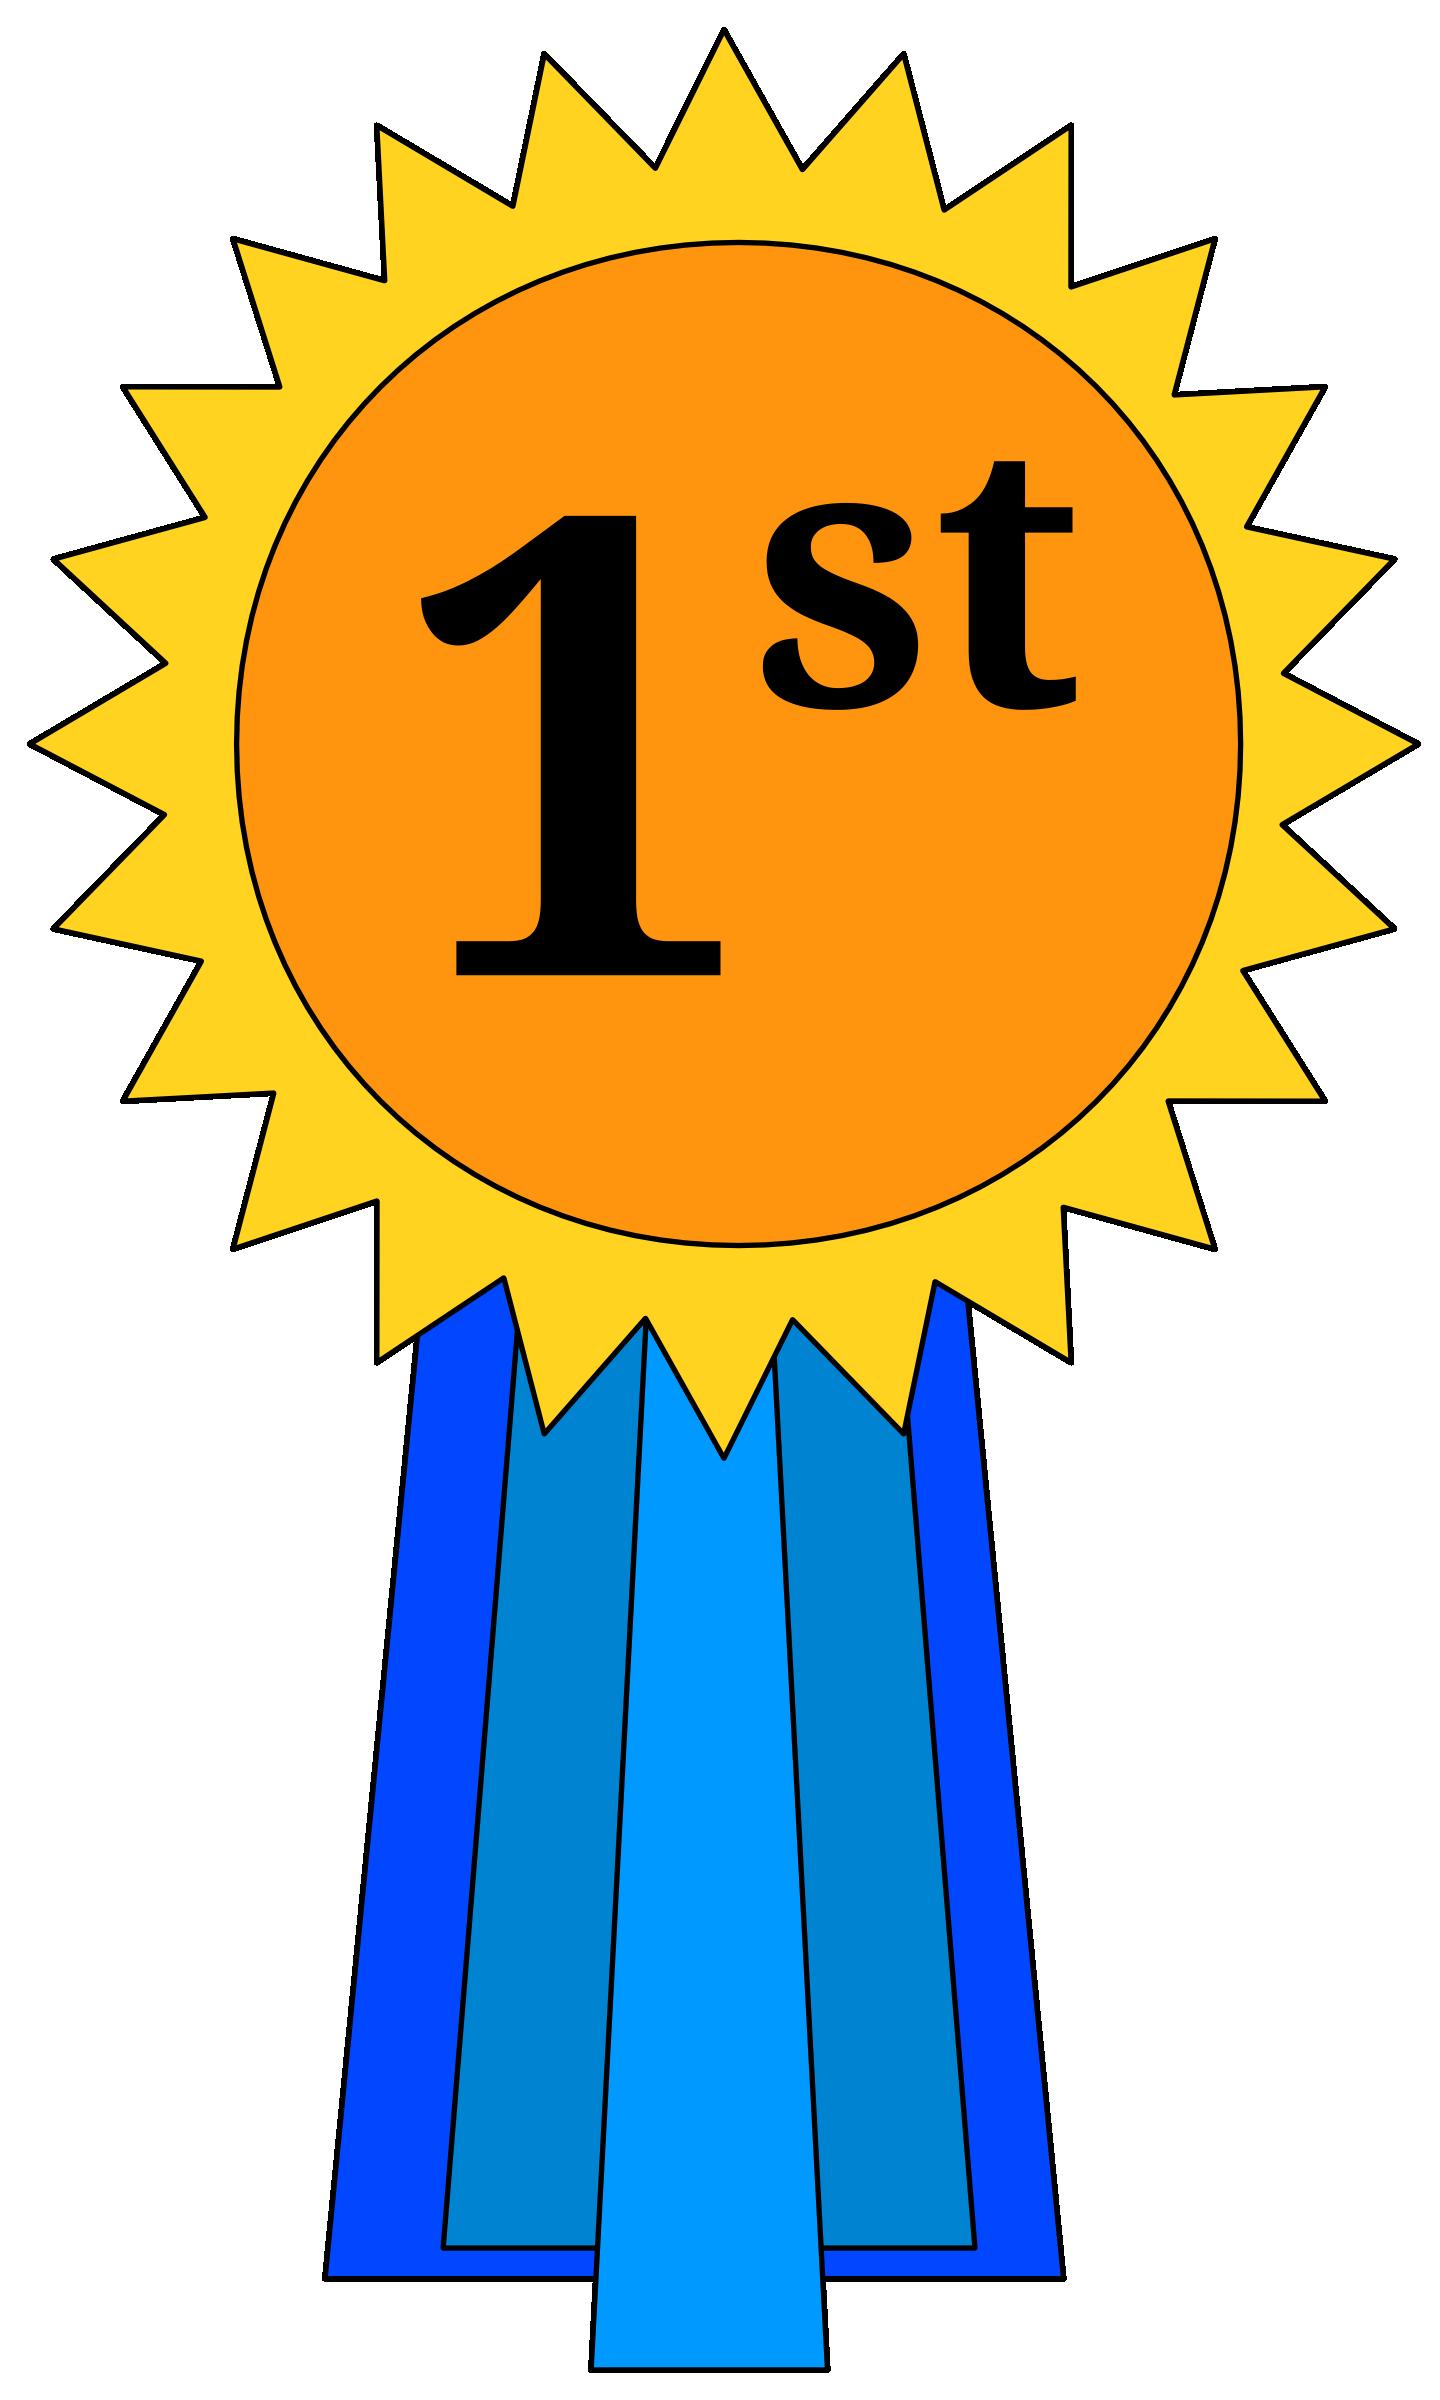 1st-place-award-ribbon-clipart-ribbon_1st_place.png